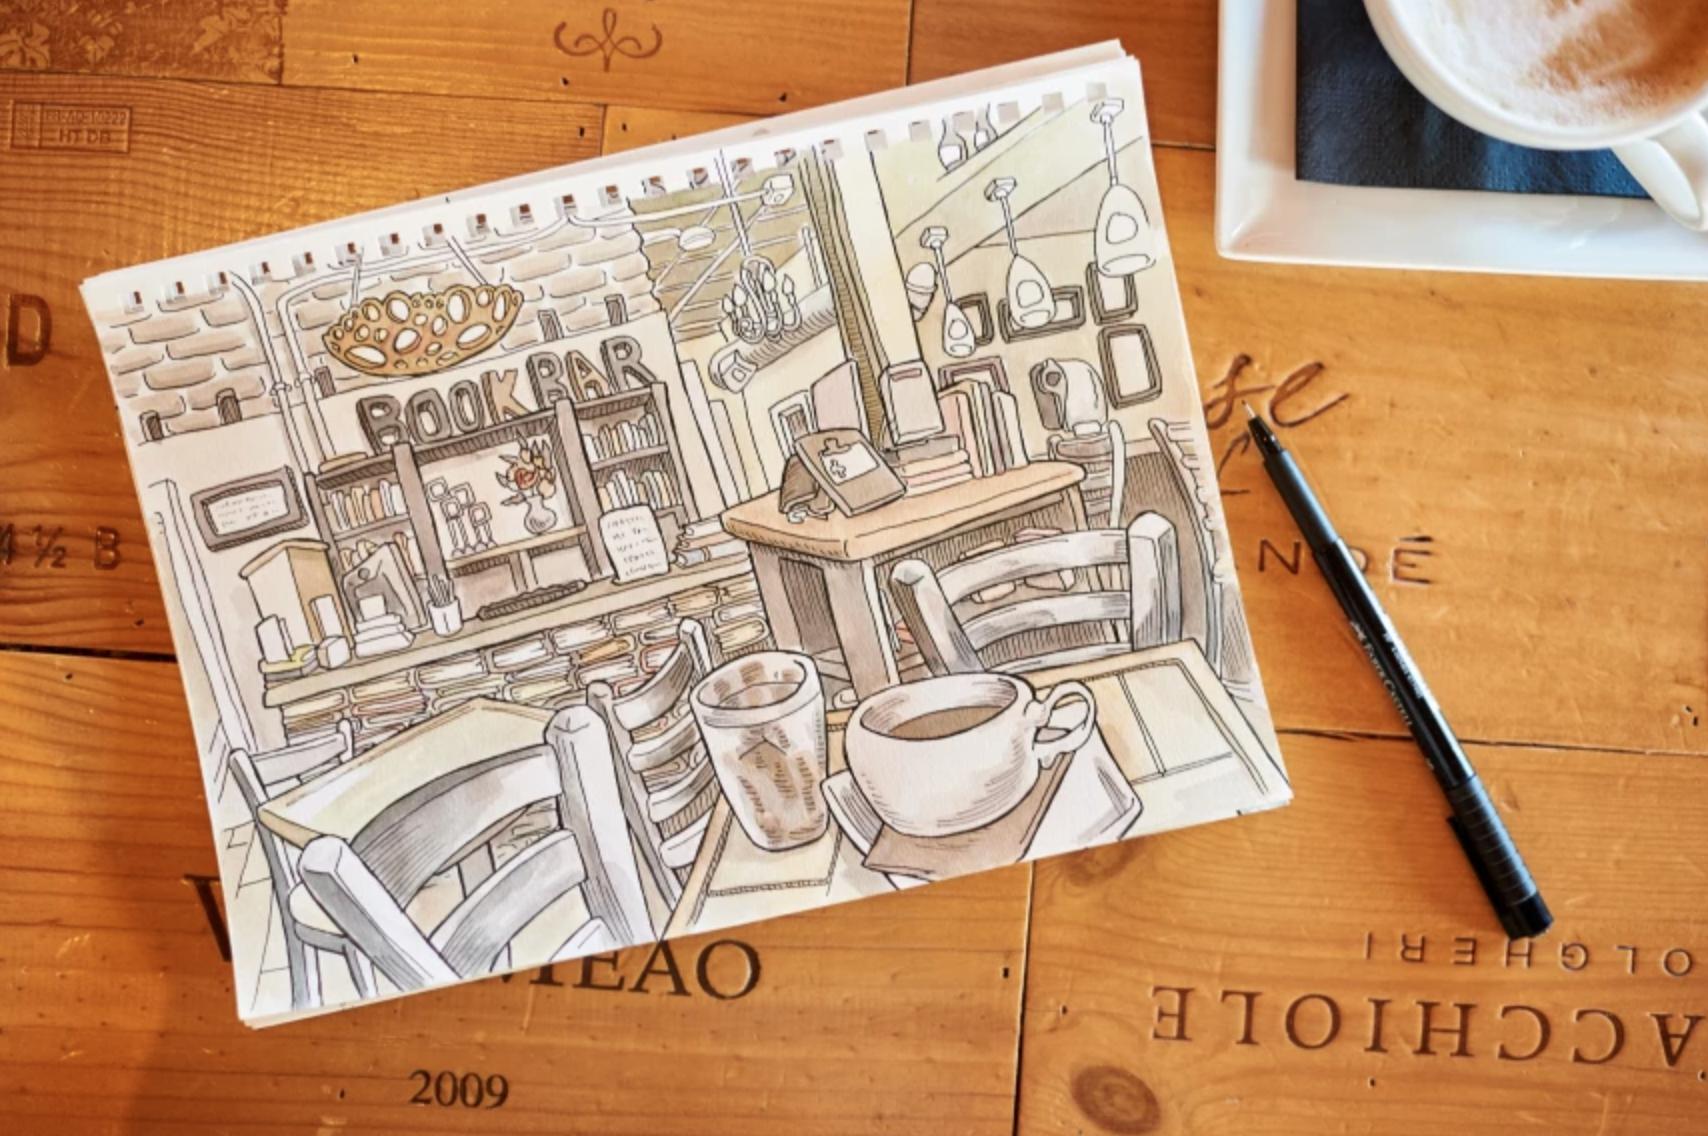 urban sketch of book bar